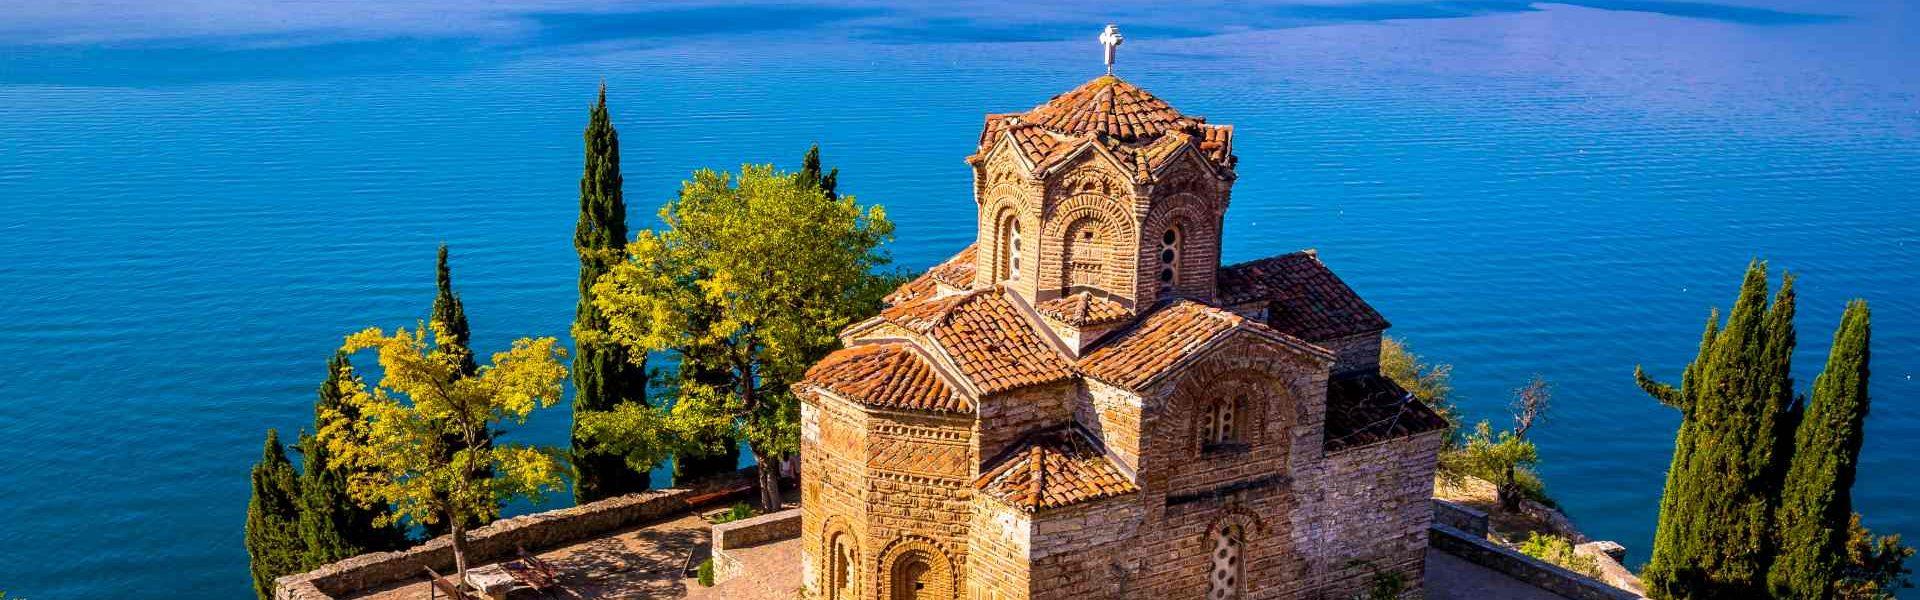 Church of Saint John the Theologian at Kaneo, overlooking Ohrid lake, Macedonia.